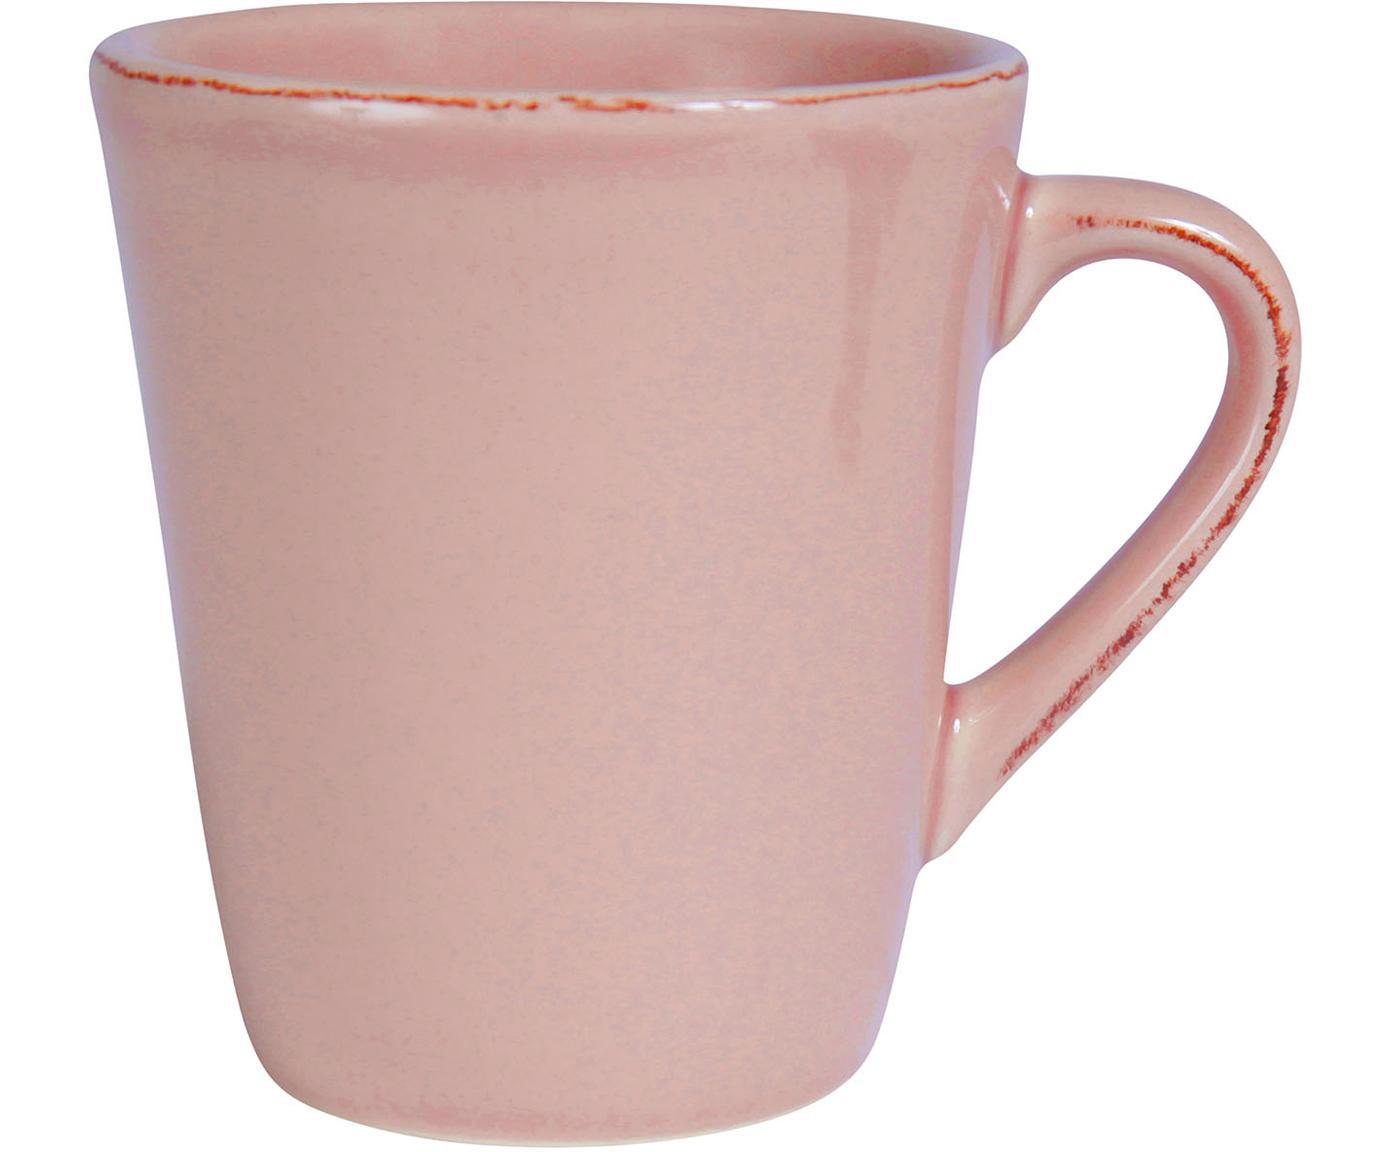 Tazas de café American, 2uds., Gres, Rosa, An 9 x L 11 cm